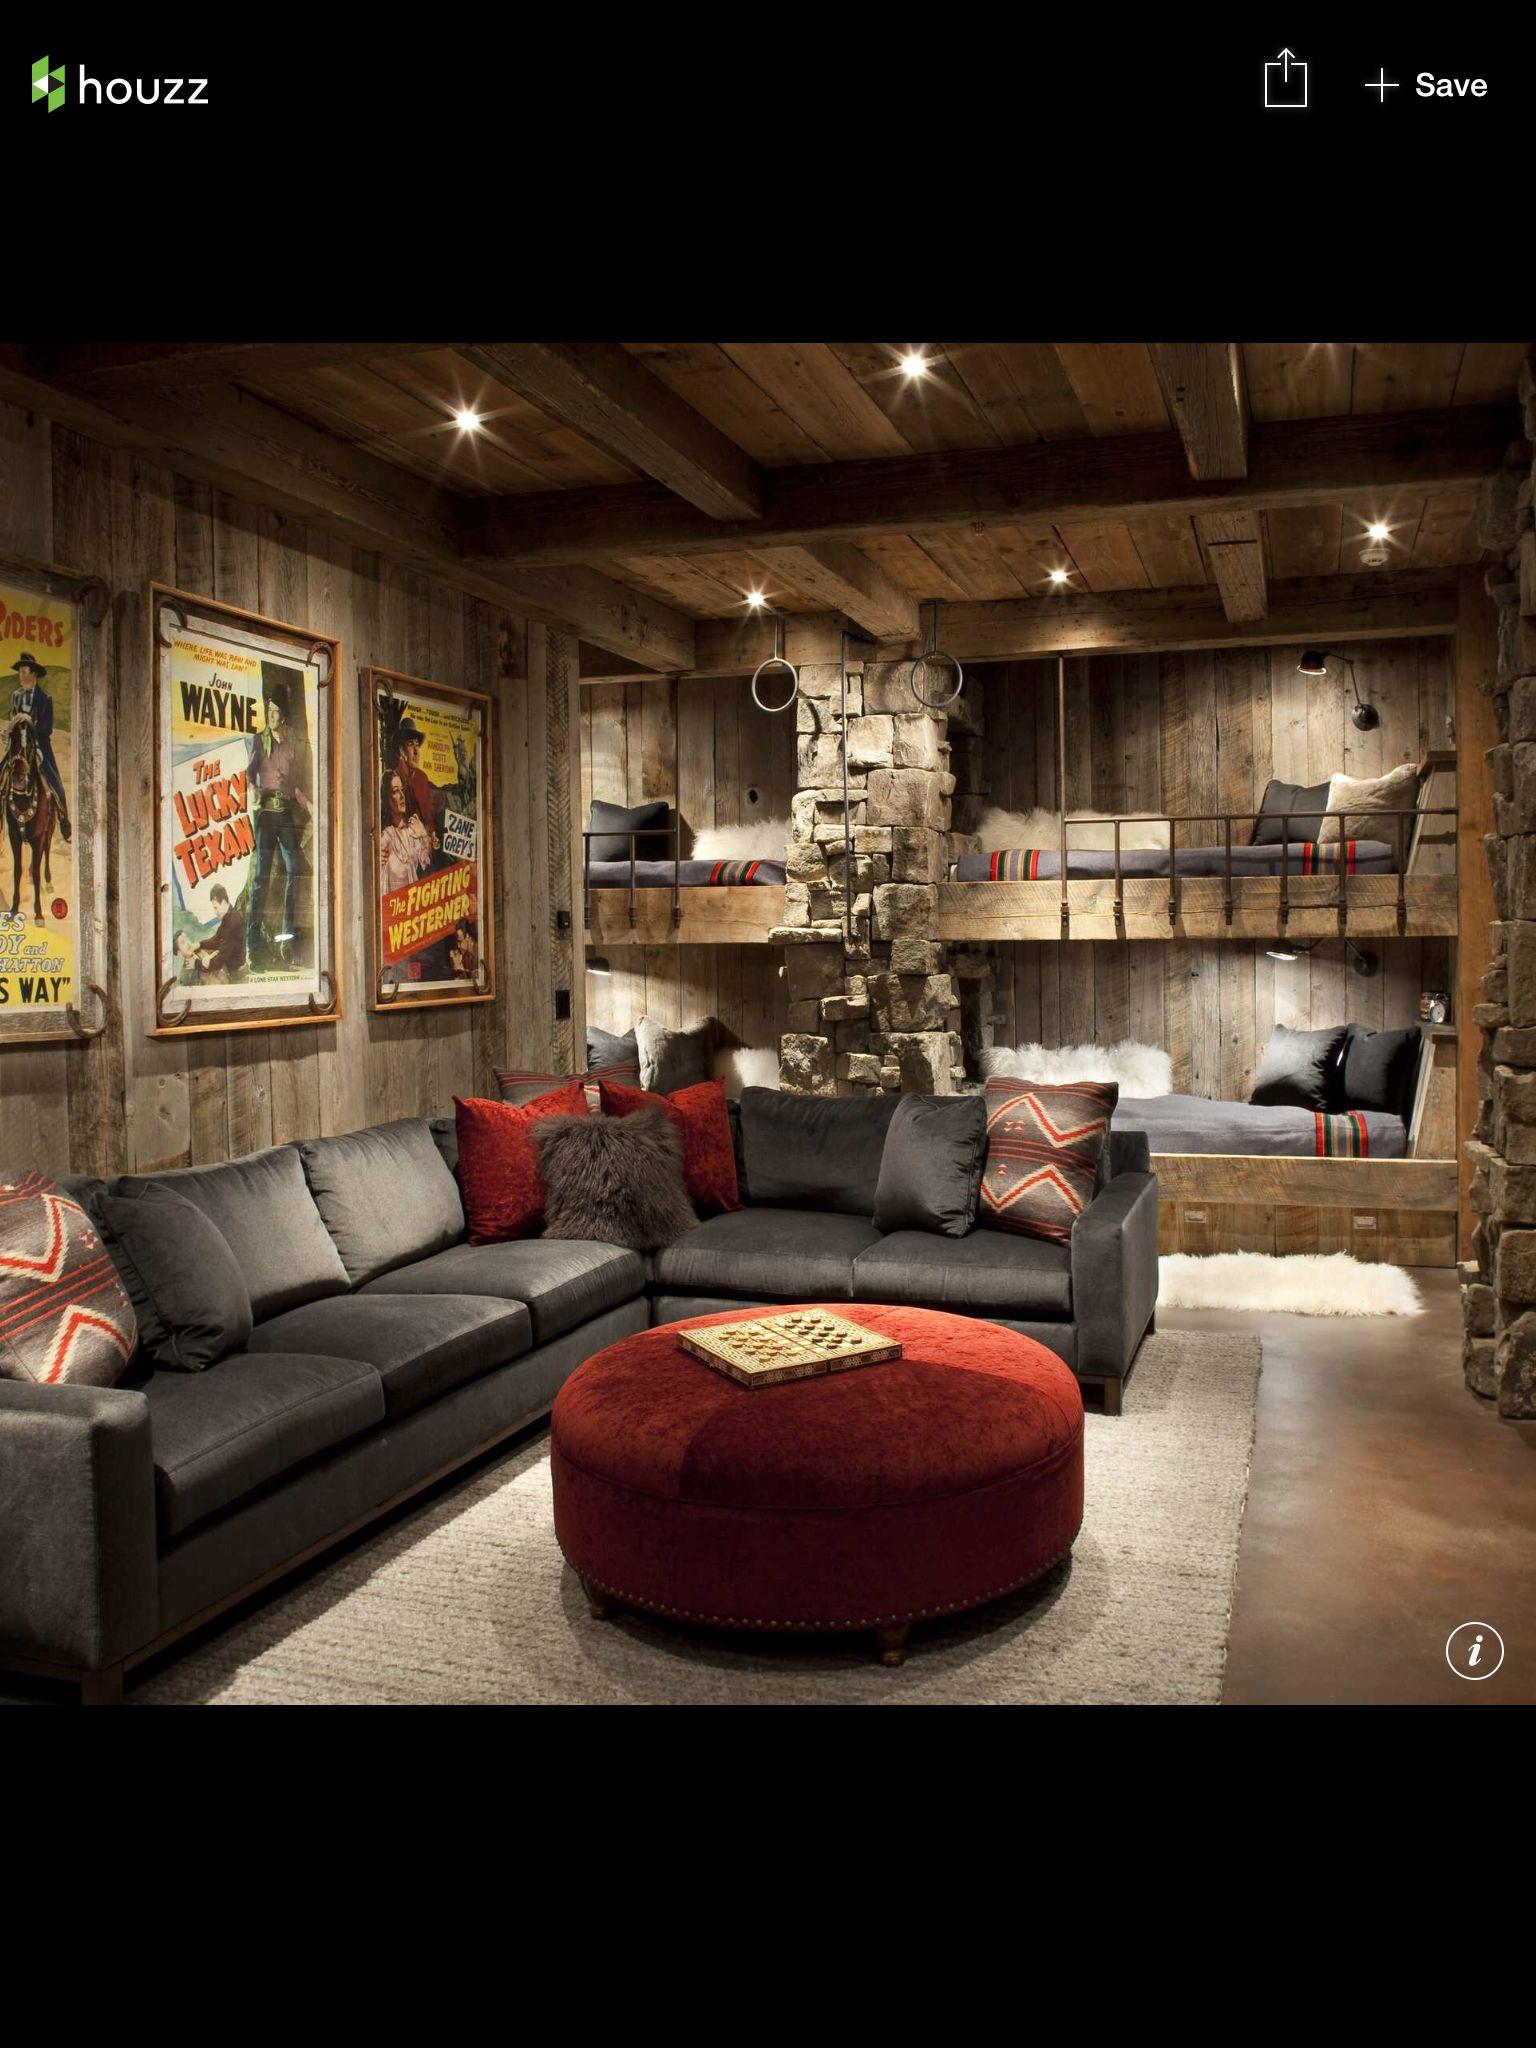 Loft above the garage. Bunk beds | Rustic living room ...